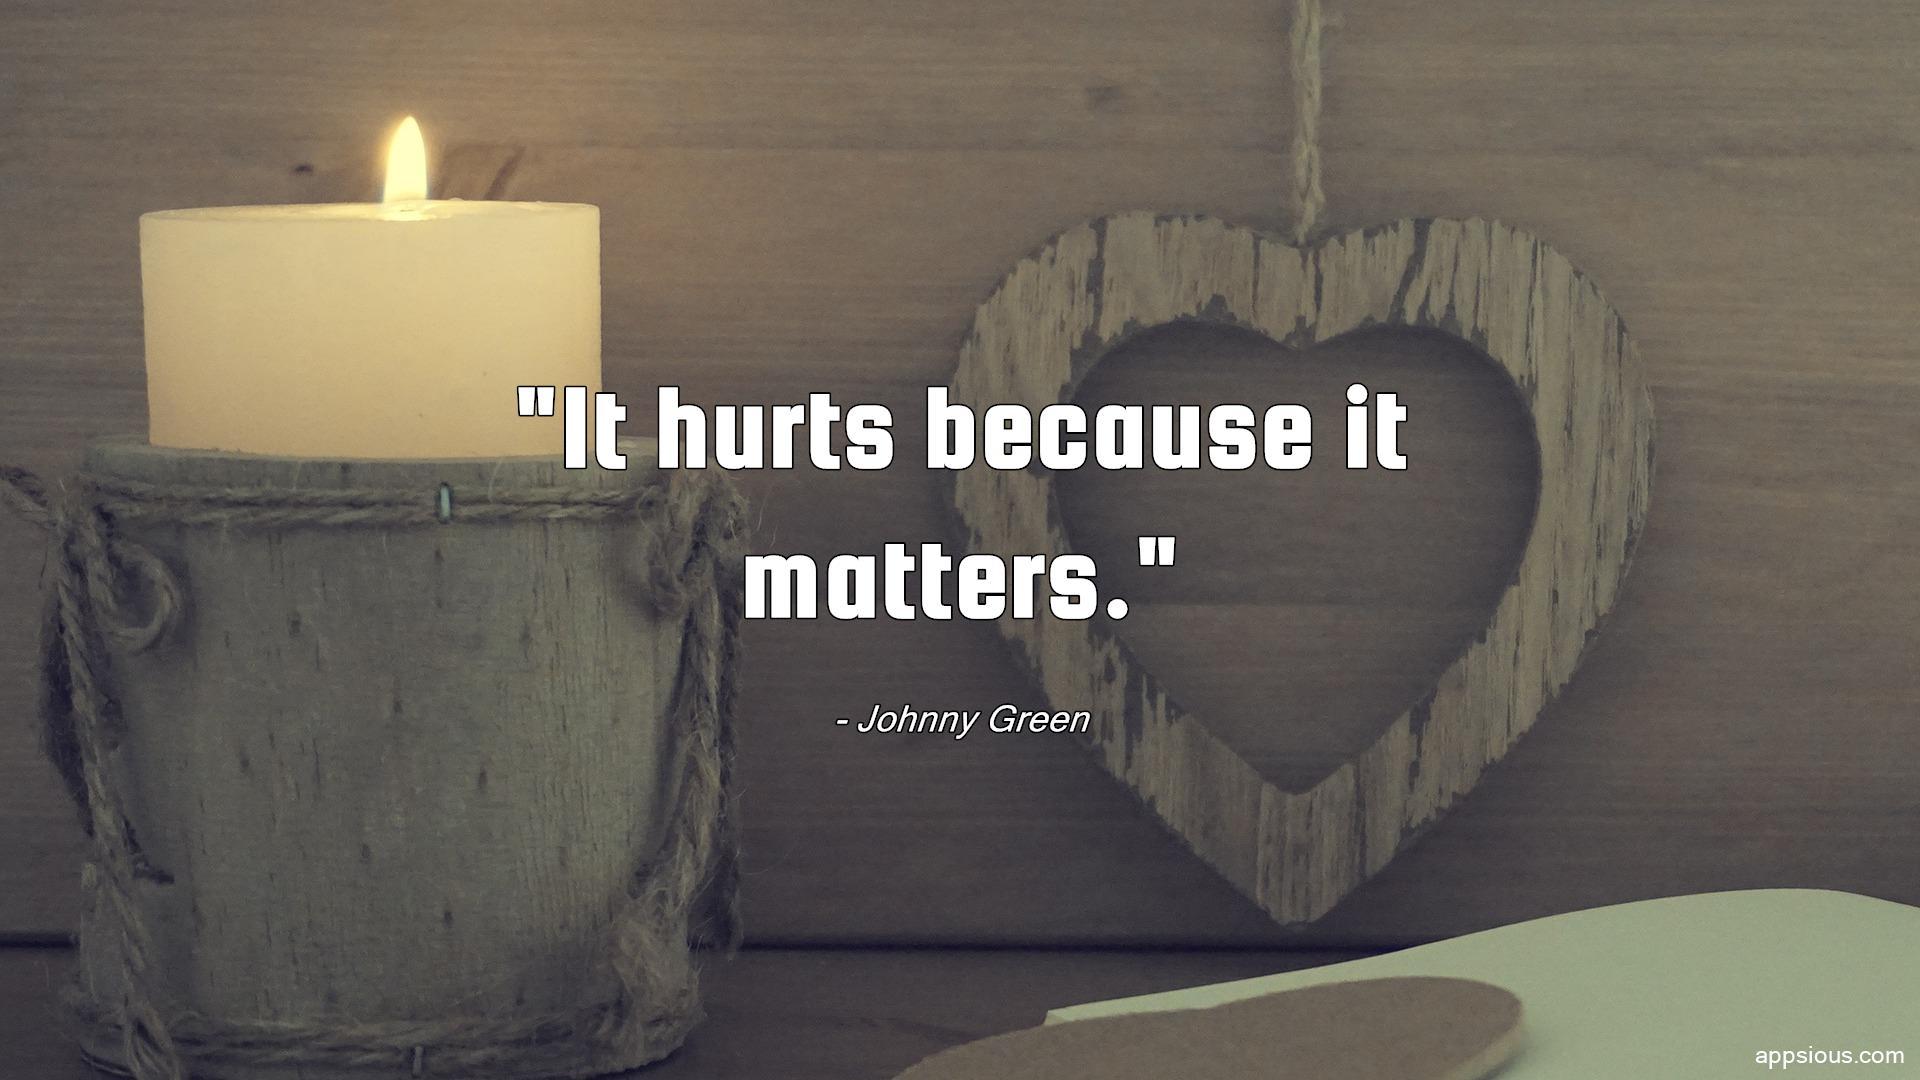 It hurts because it matters.